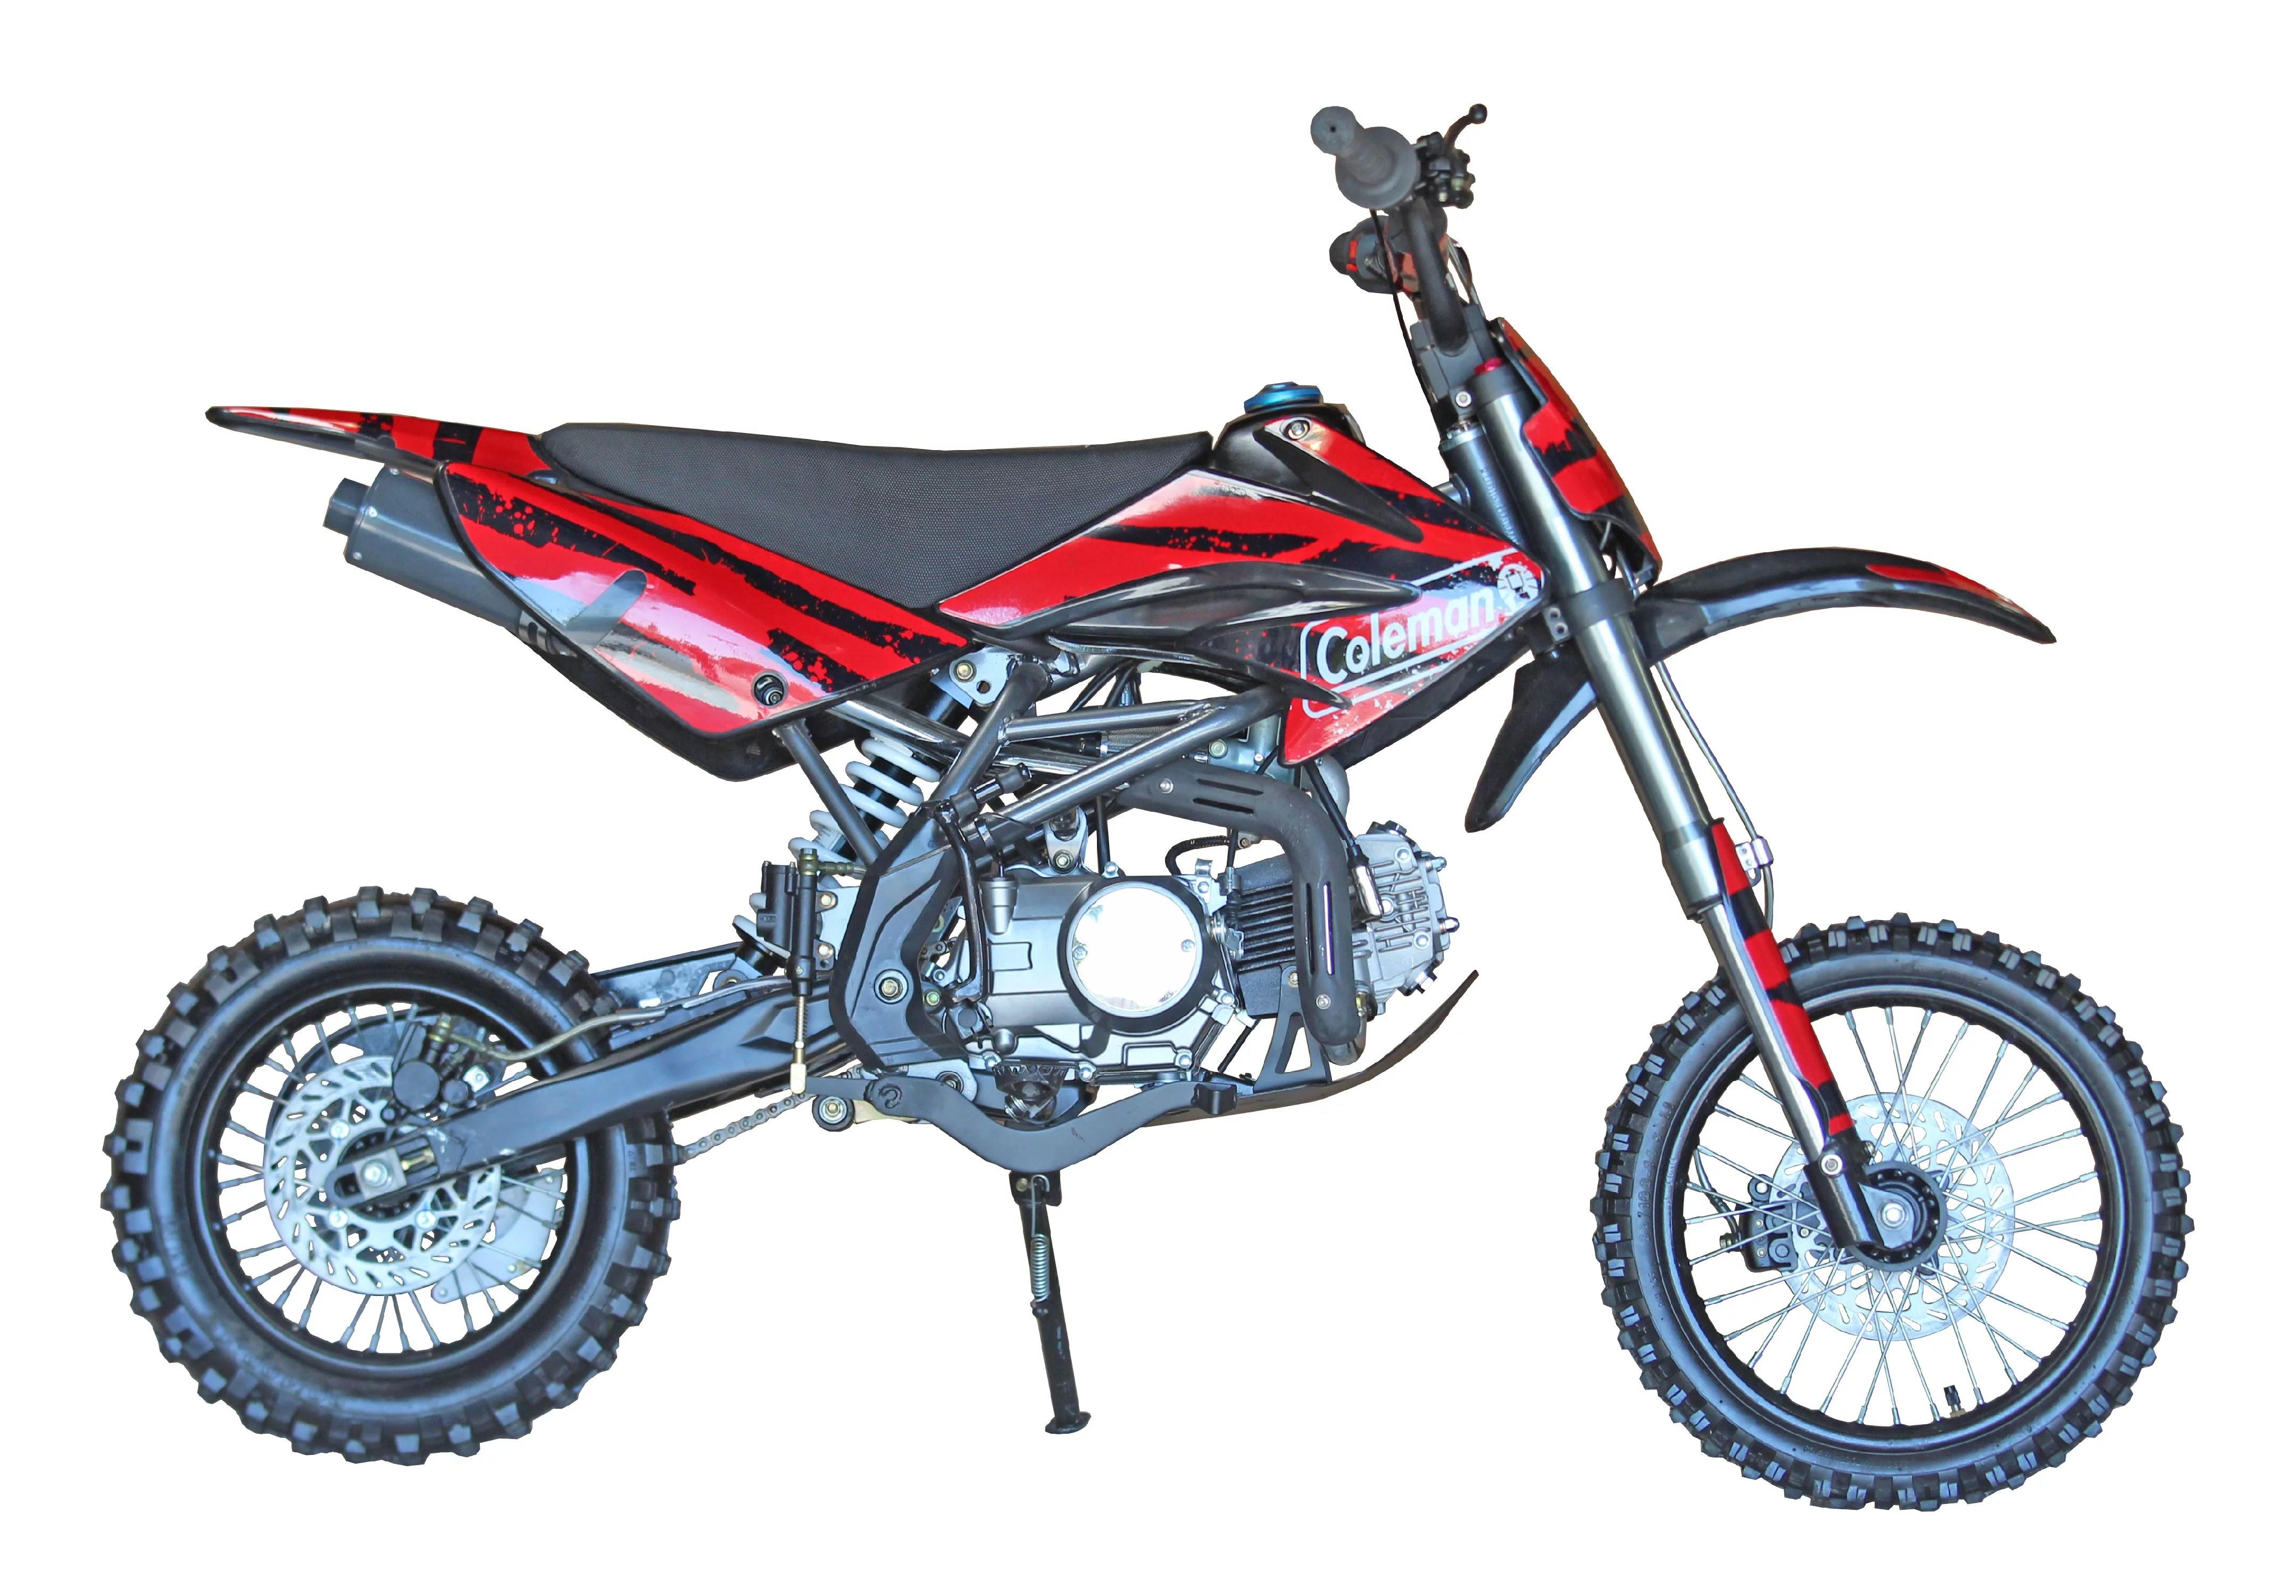 xtreme 90cc atv wiring diagram 8908 redcat 50cc dirt bike wiring diagram wiring library  8908 redcat 50cc dirt bike wiring